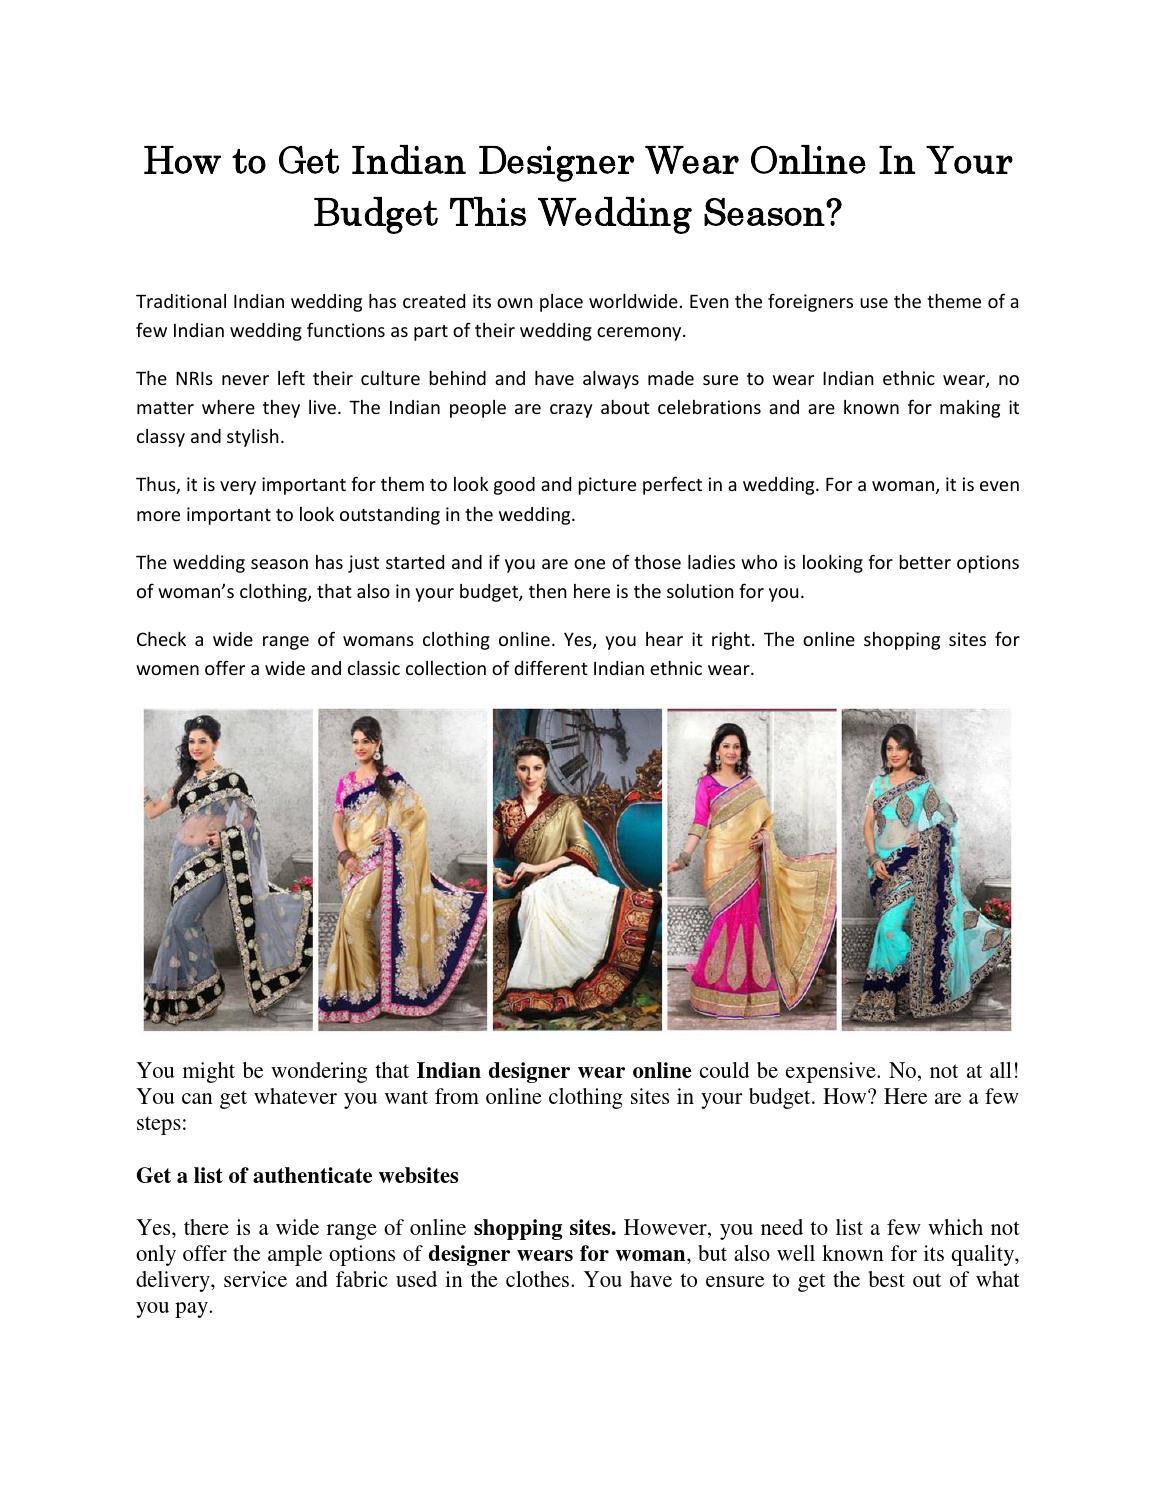 Best Online Sites For Indian Dresses | Saddha